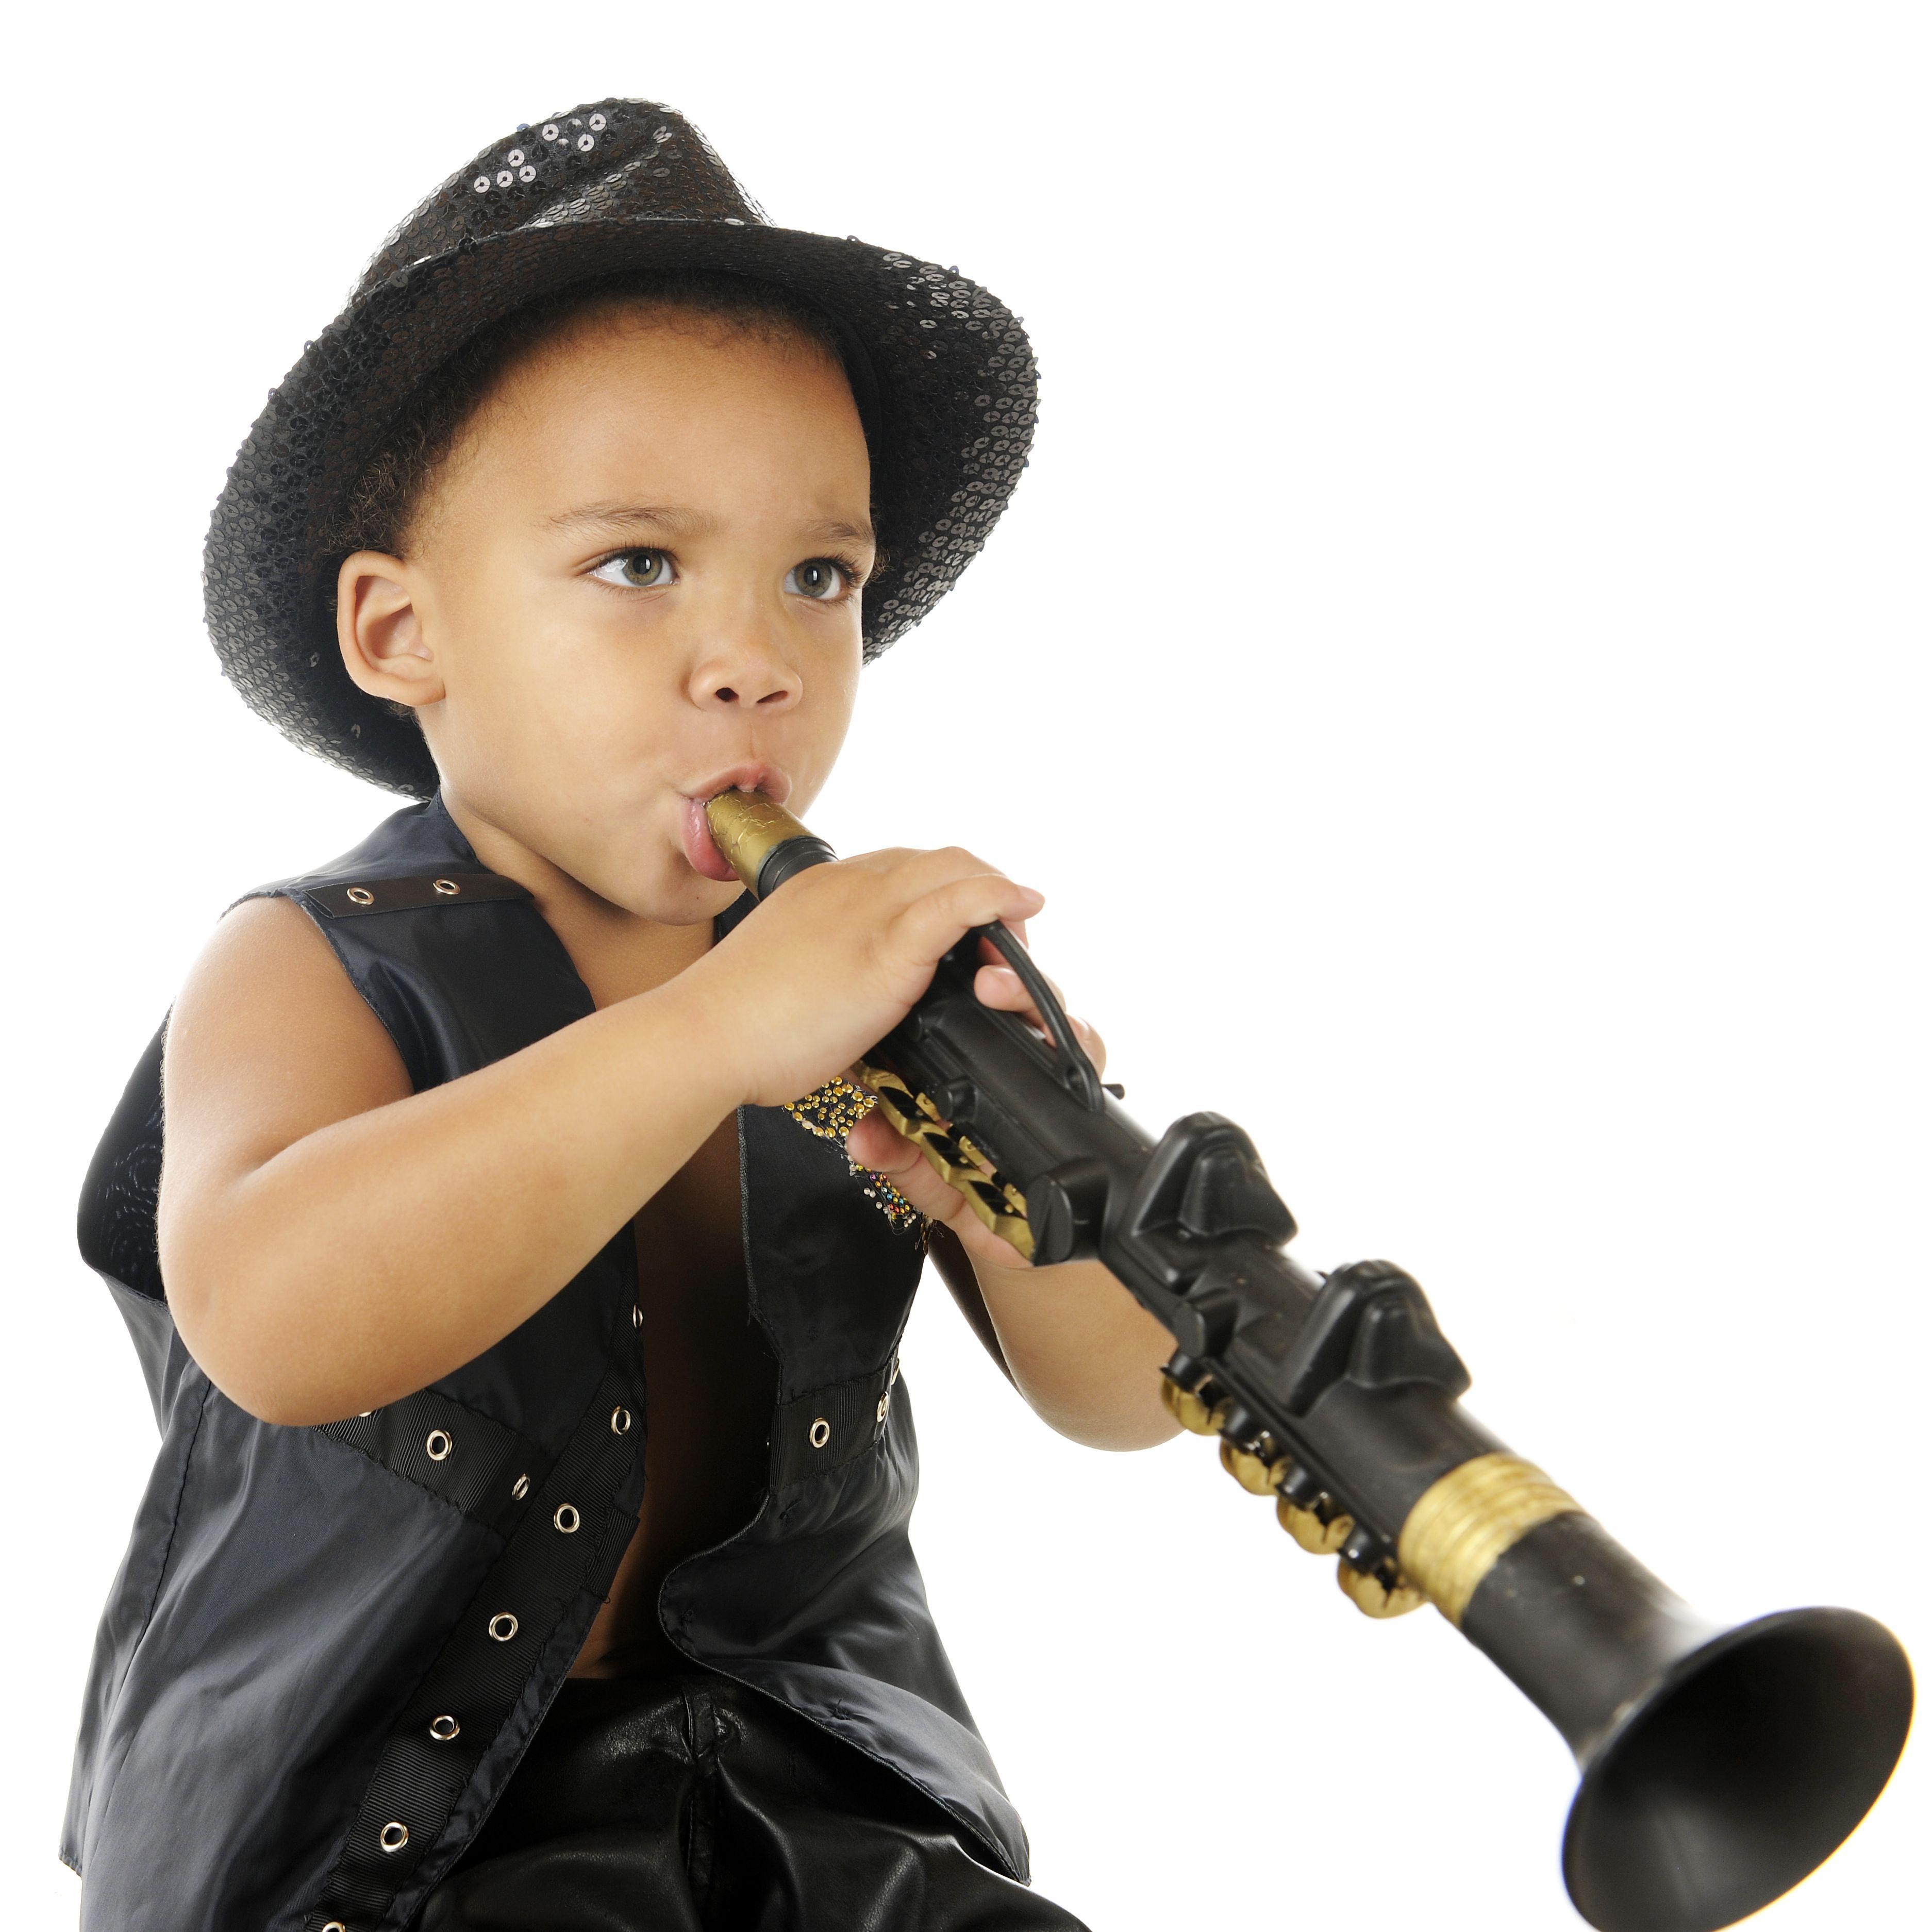 bigstock-An-adorable-preschooler-playin-97815512-compressor